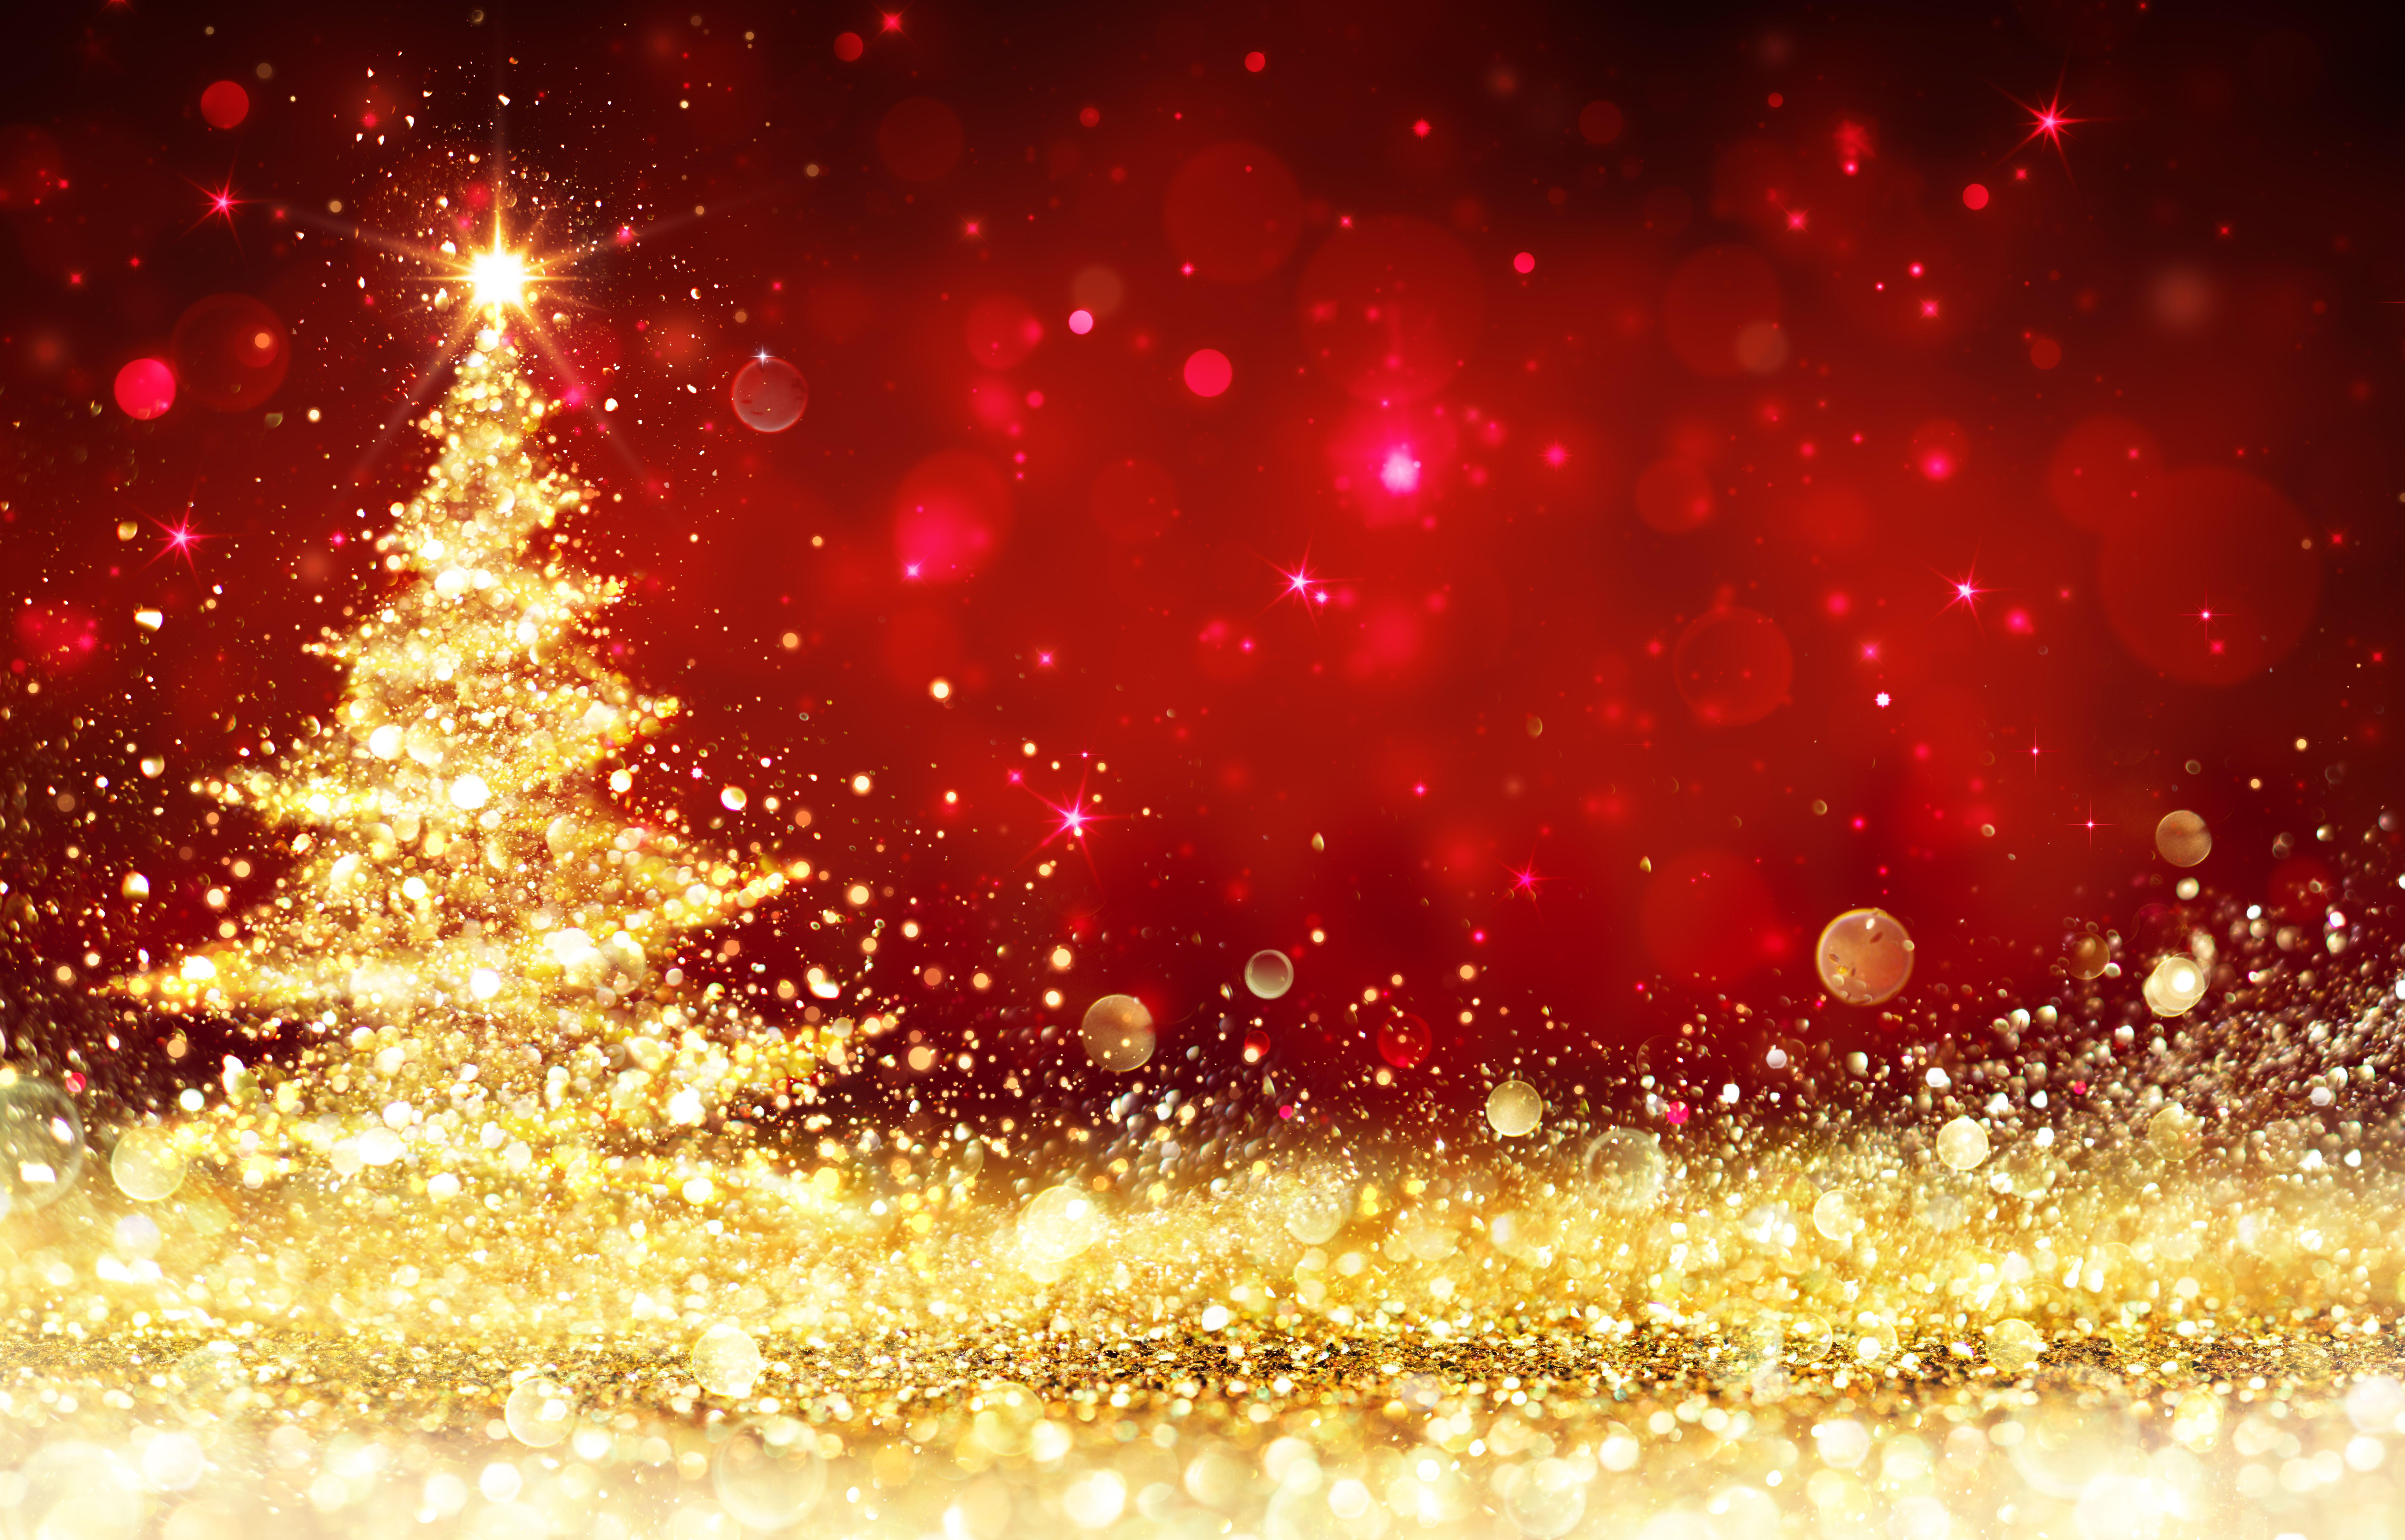 8k Ultra Hd Christmas Wallpapers Top Free 8k Ultra Hd Christmas Backgrounds Wallpaperaccess